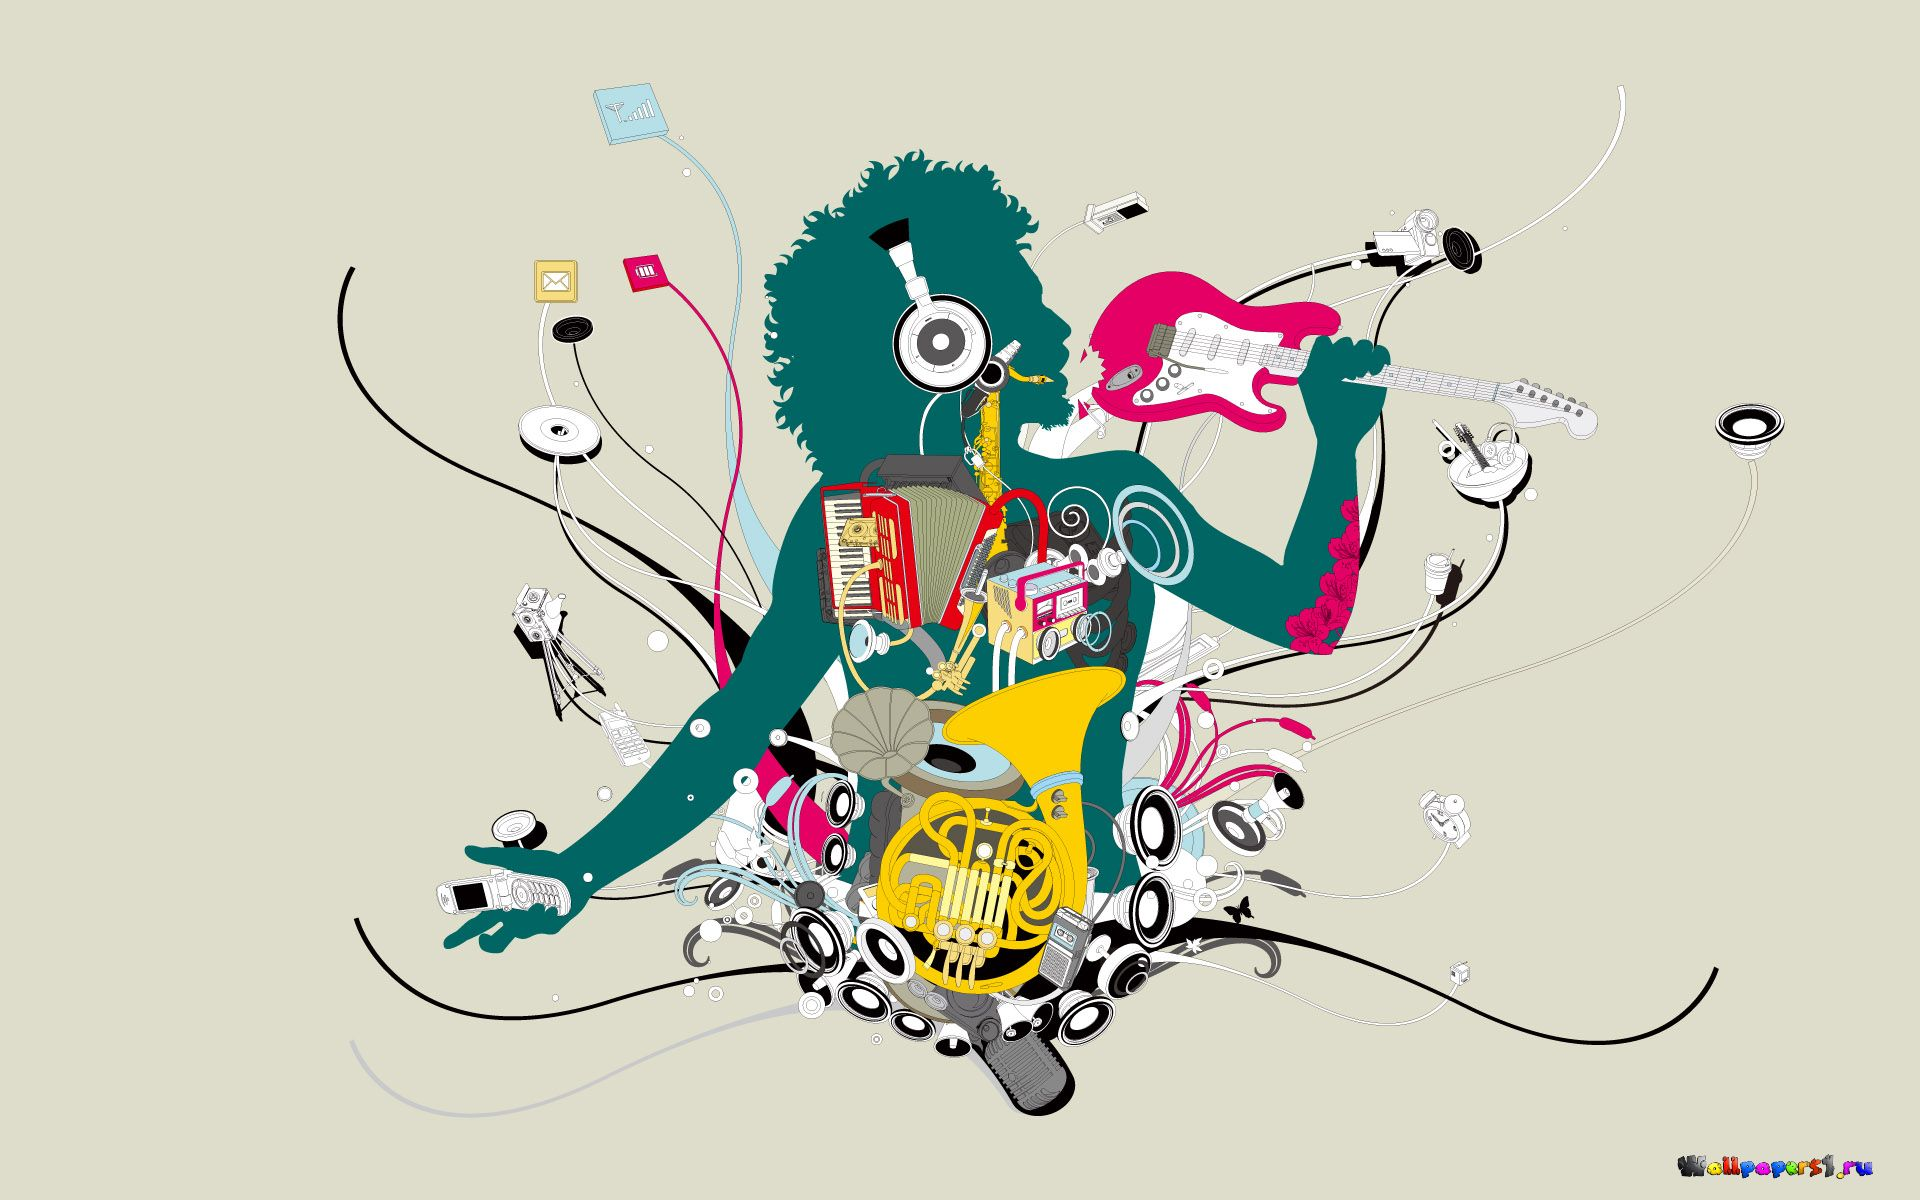 графика музыка graphics music бесплатно